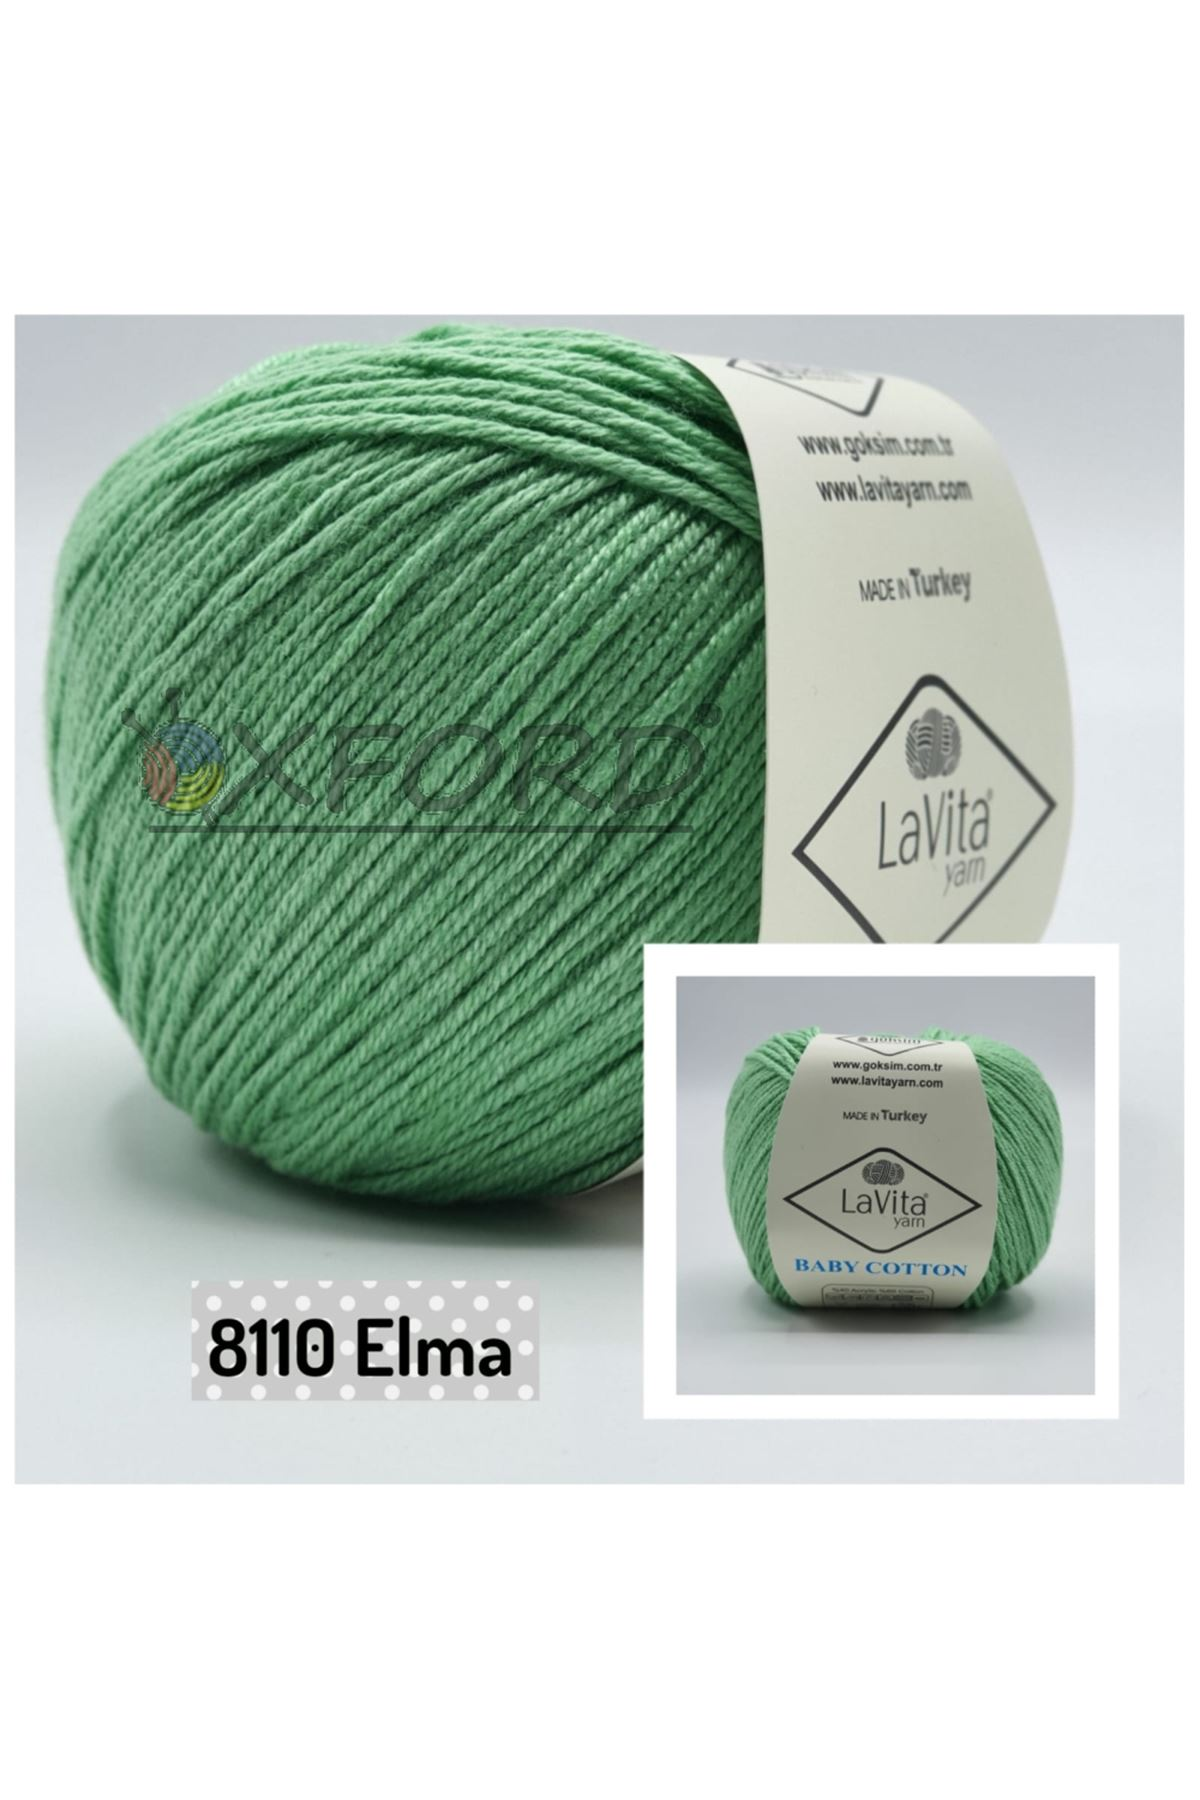 Lavita Baby Cotton 8110 Elma